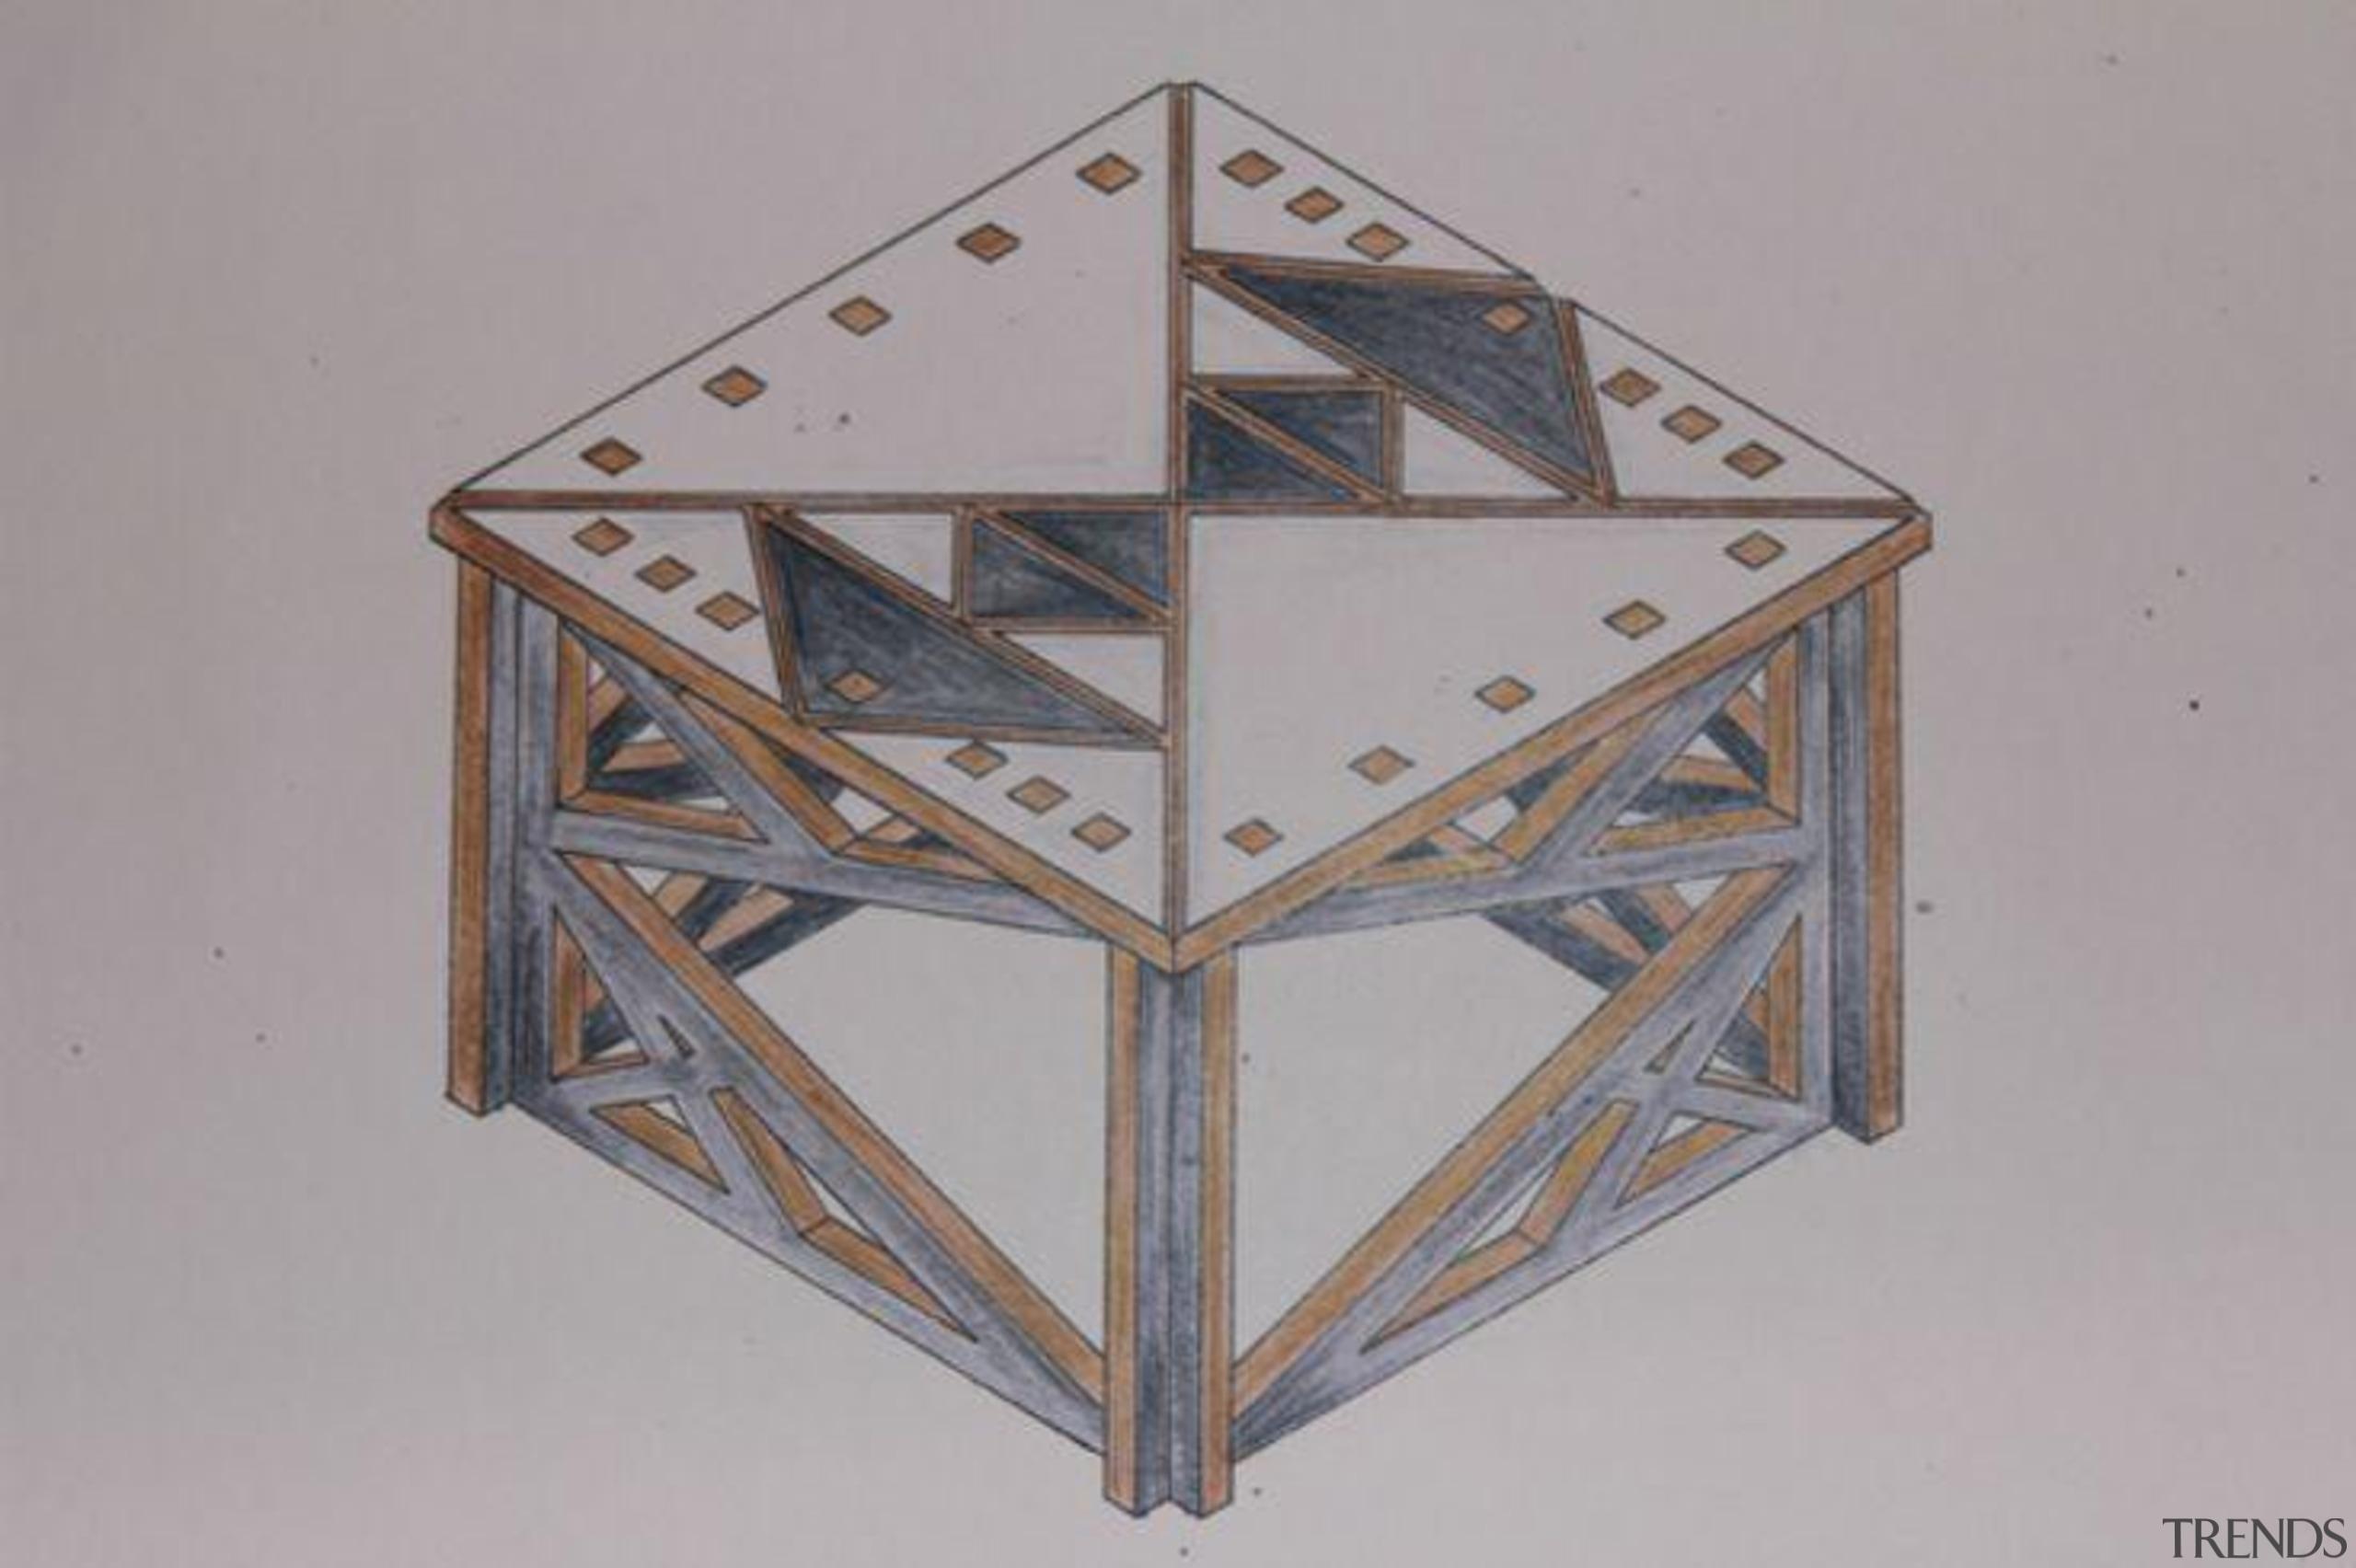 8b06351839a541611faf04b60cd3b01c.jpg - 8b06351839a541611faf04b60cd3b01c.jpg - angle   product design angle, product design, triangle, gray